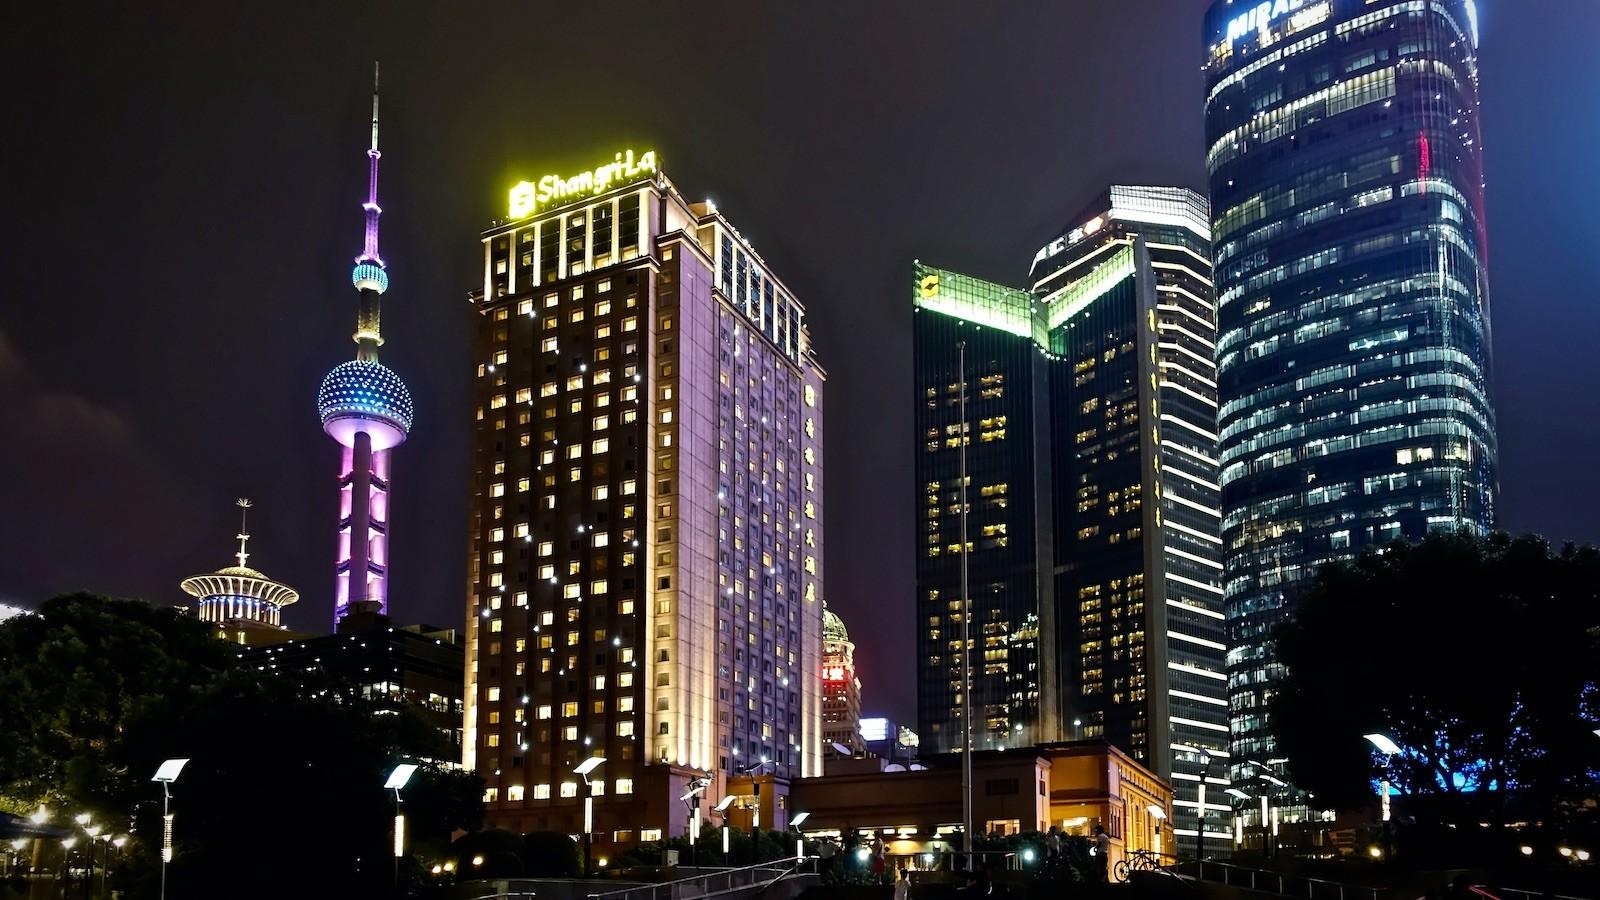 China Shanghai Pudong Skyline